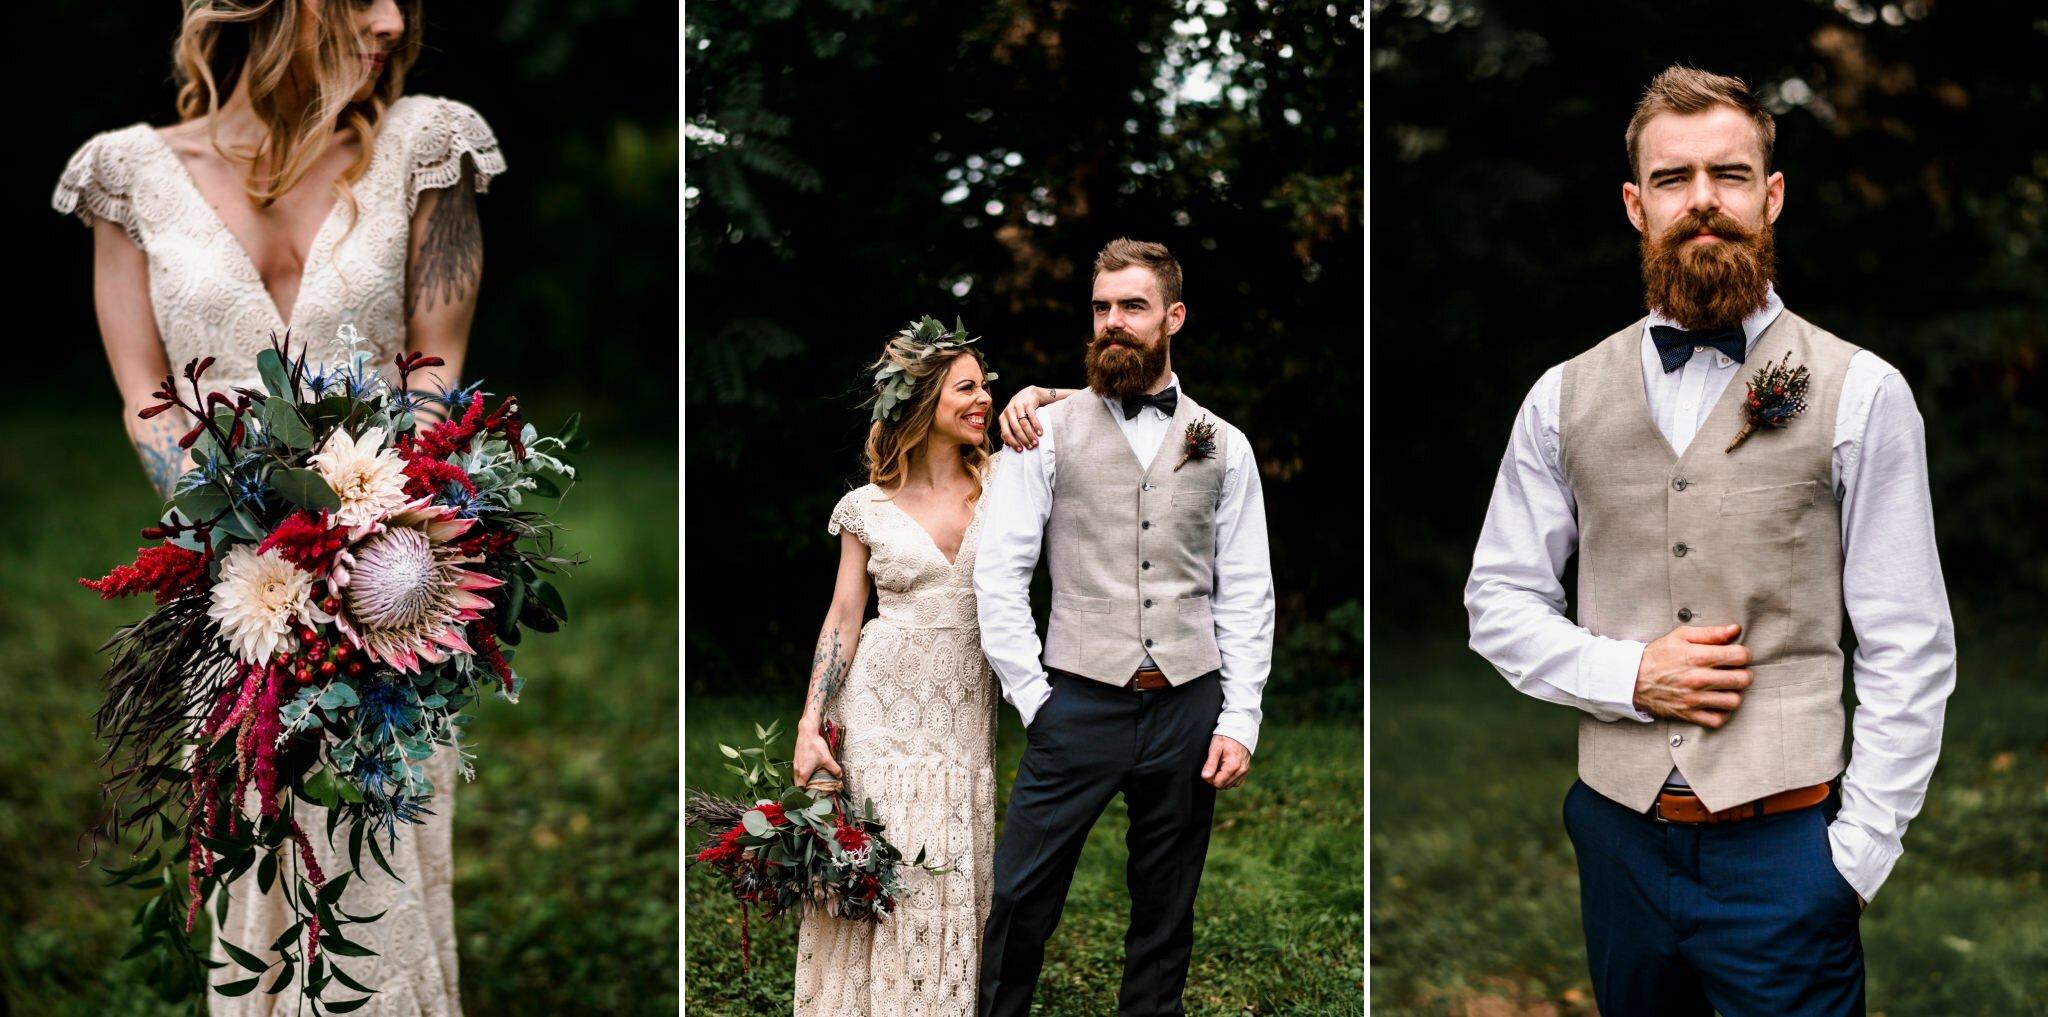 Hoffman-618-New-Jersey-Wedding-Photographer-53.JPG